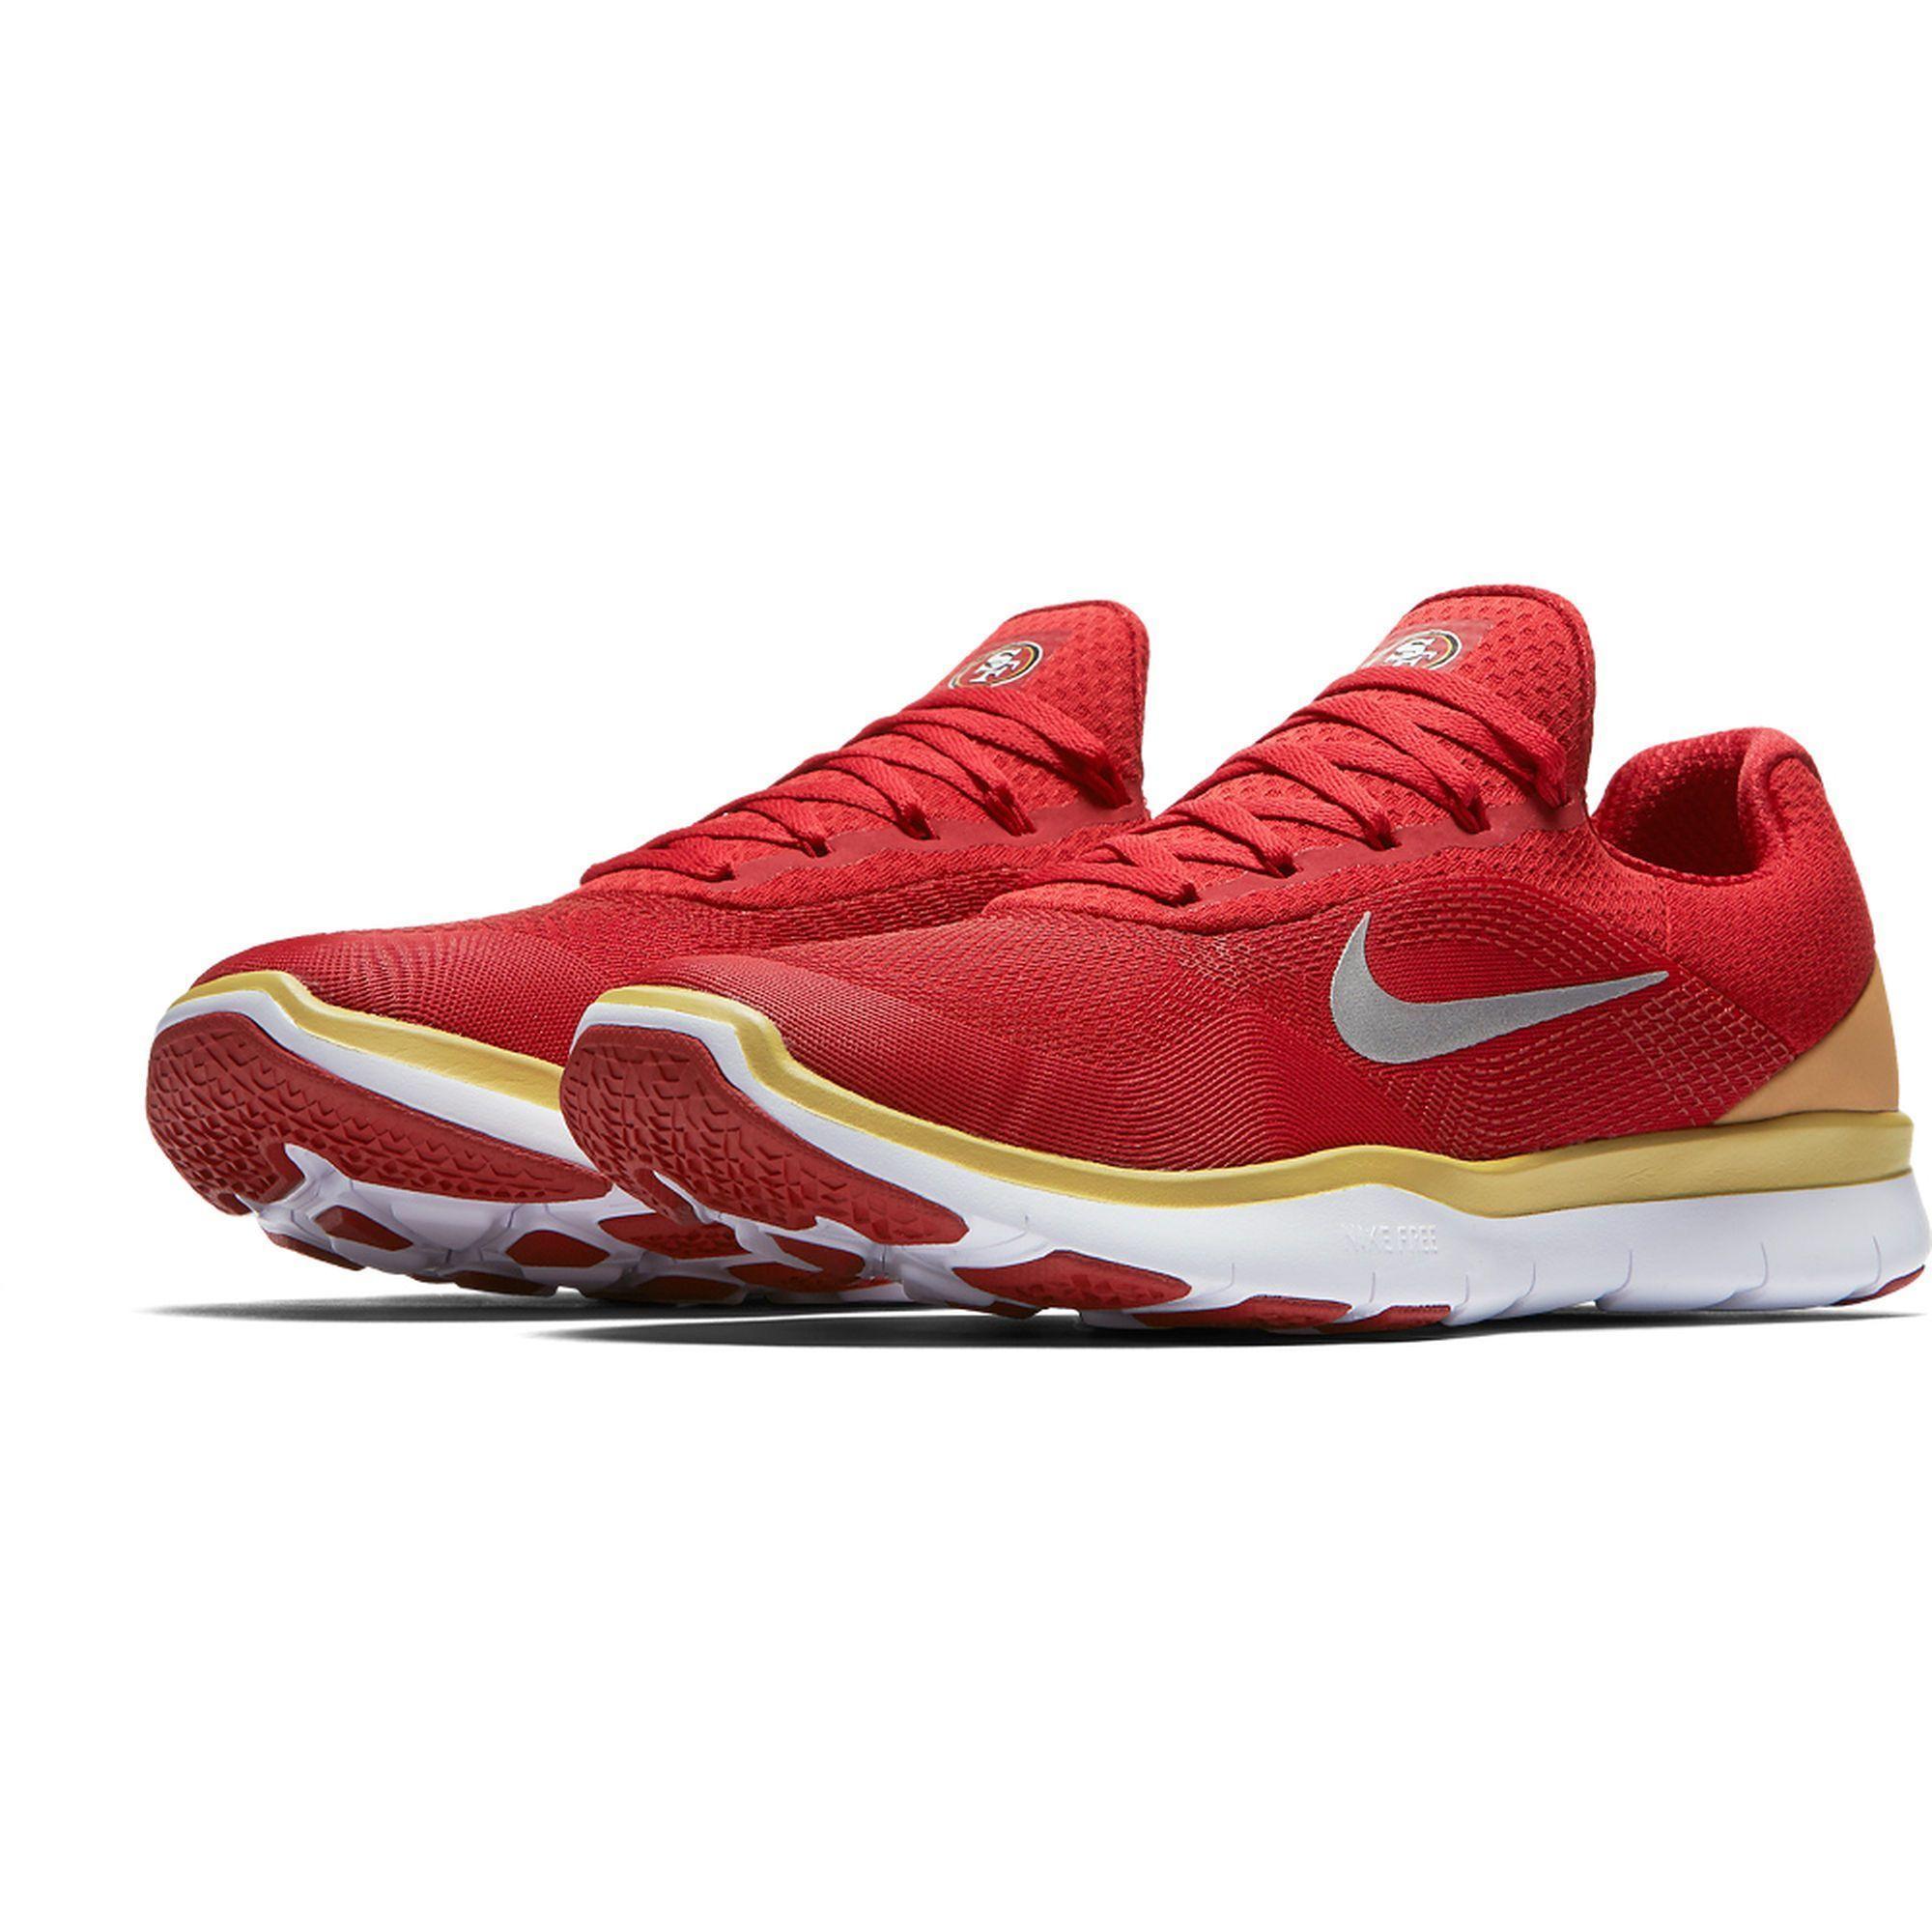 a6ceb3a844 San Francisco 49ers Nike NFL Free Trainer V7 Week Zero Shoes | Nike ...